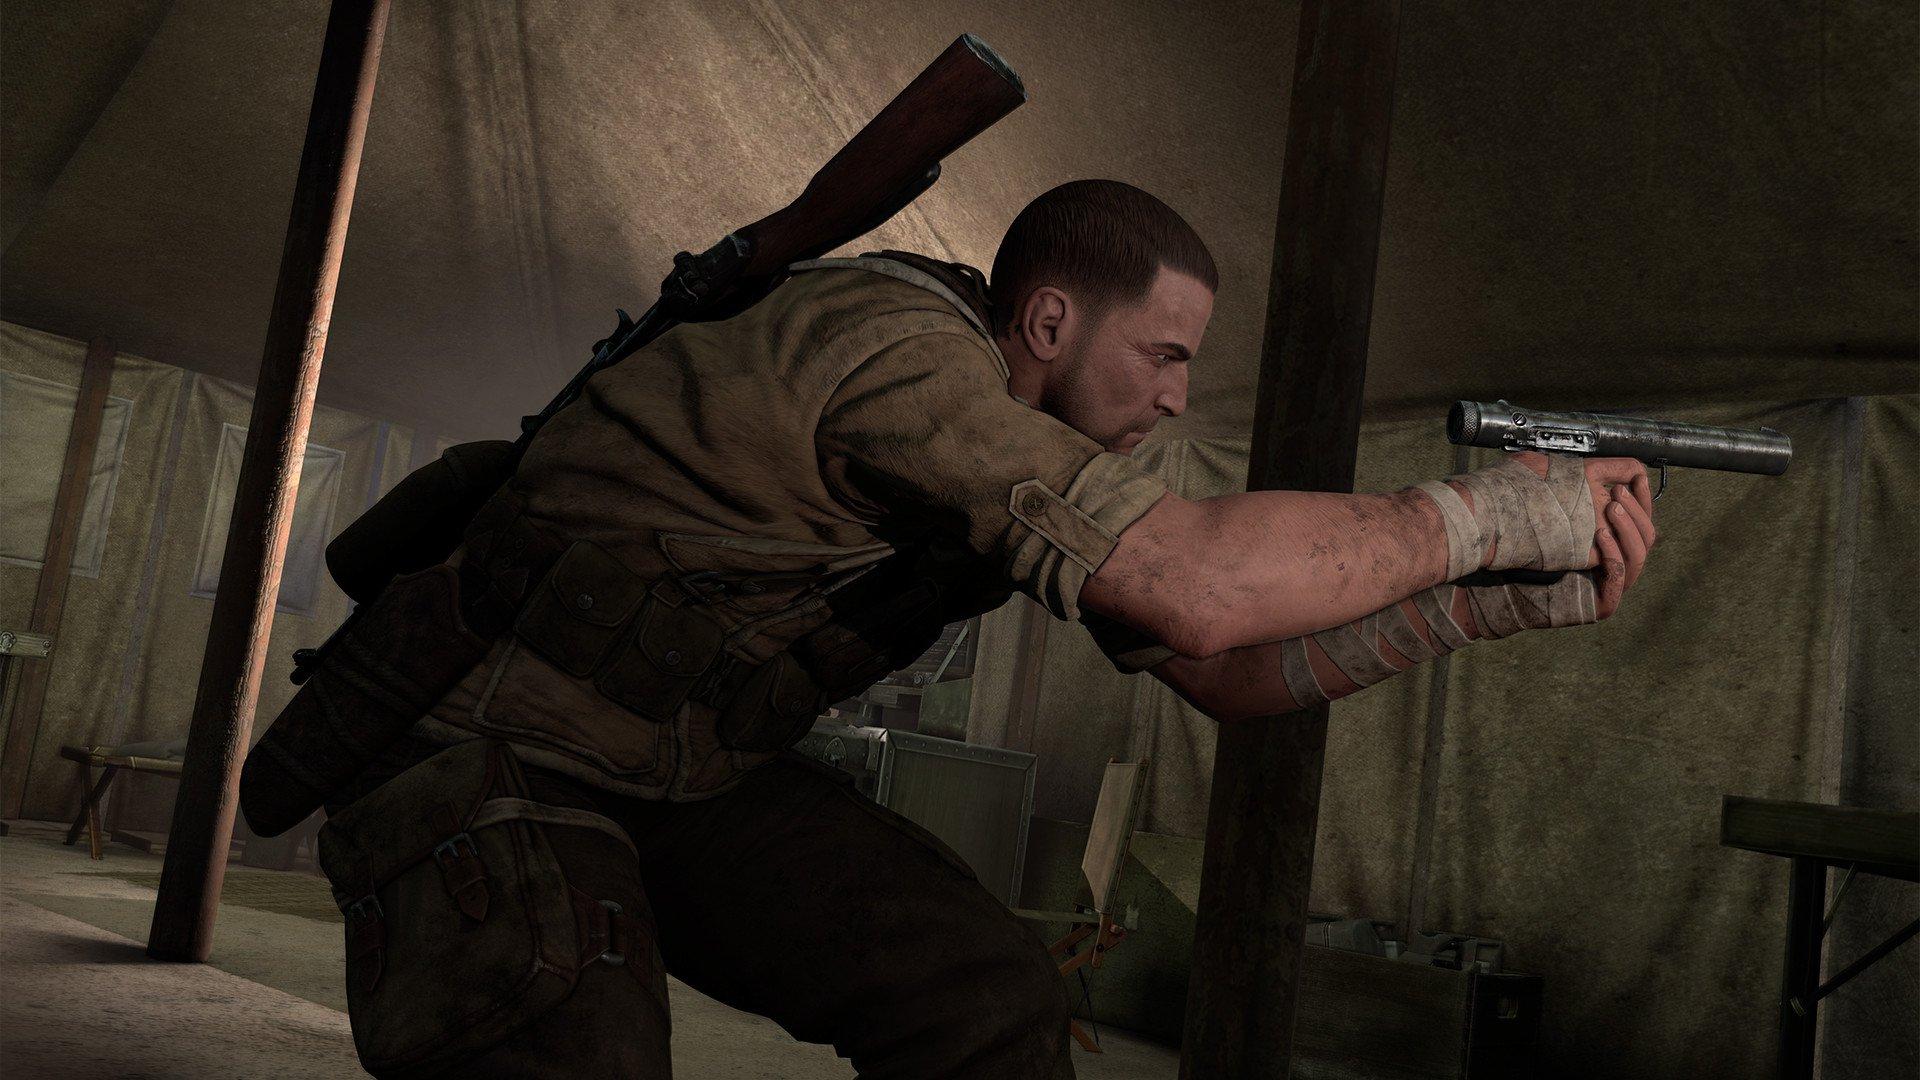 sniper elite 3 2537595 تصاویر جدیدی از Sniper Elite 3 منتشر شد : بیابان گردی در آفریقا